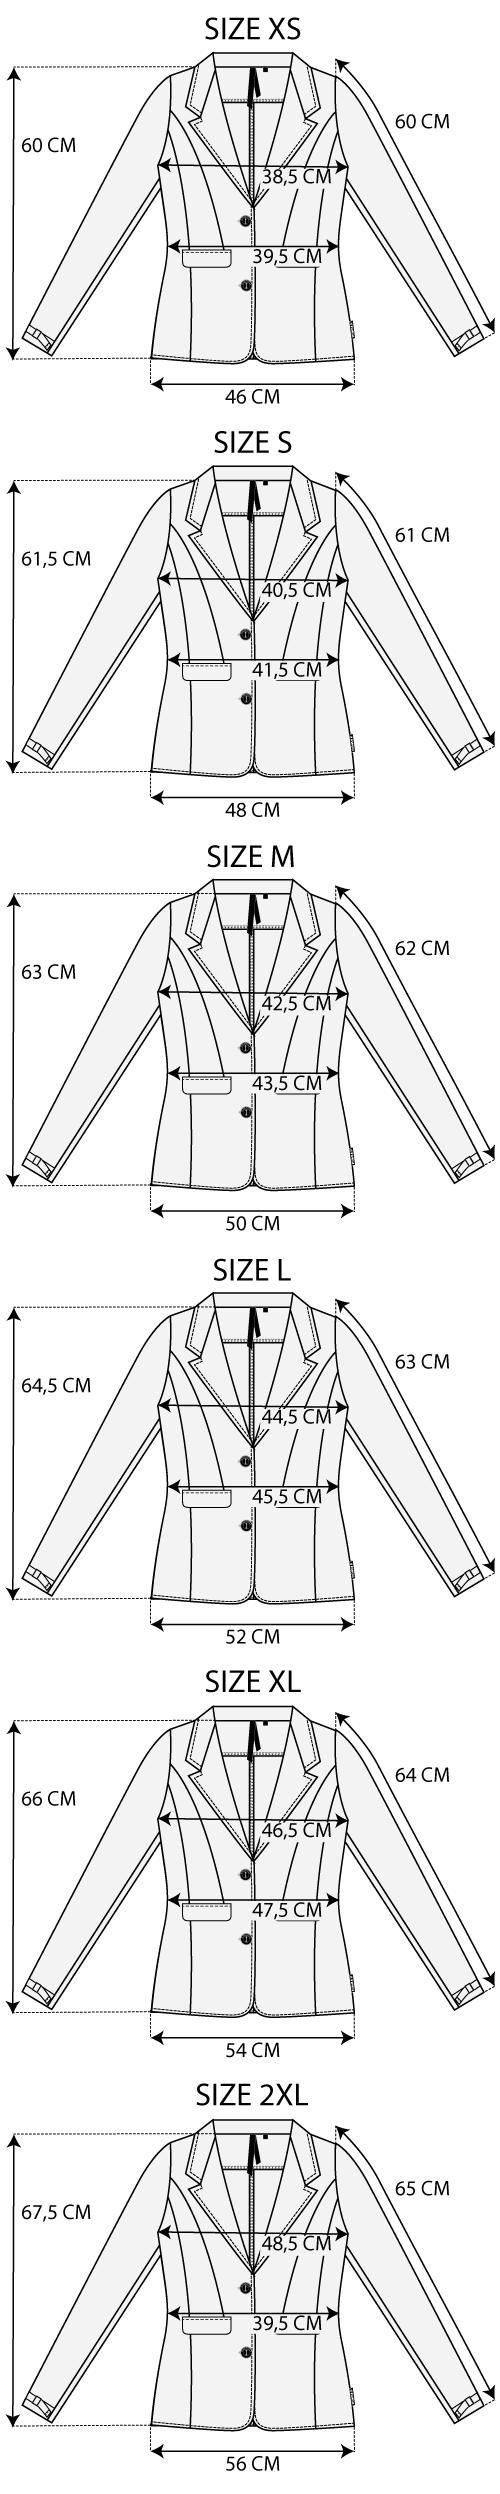 Maattabel Easy Jacket